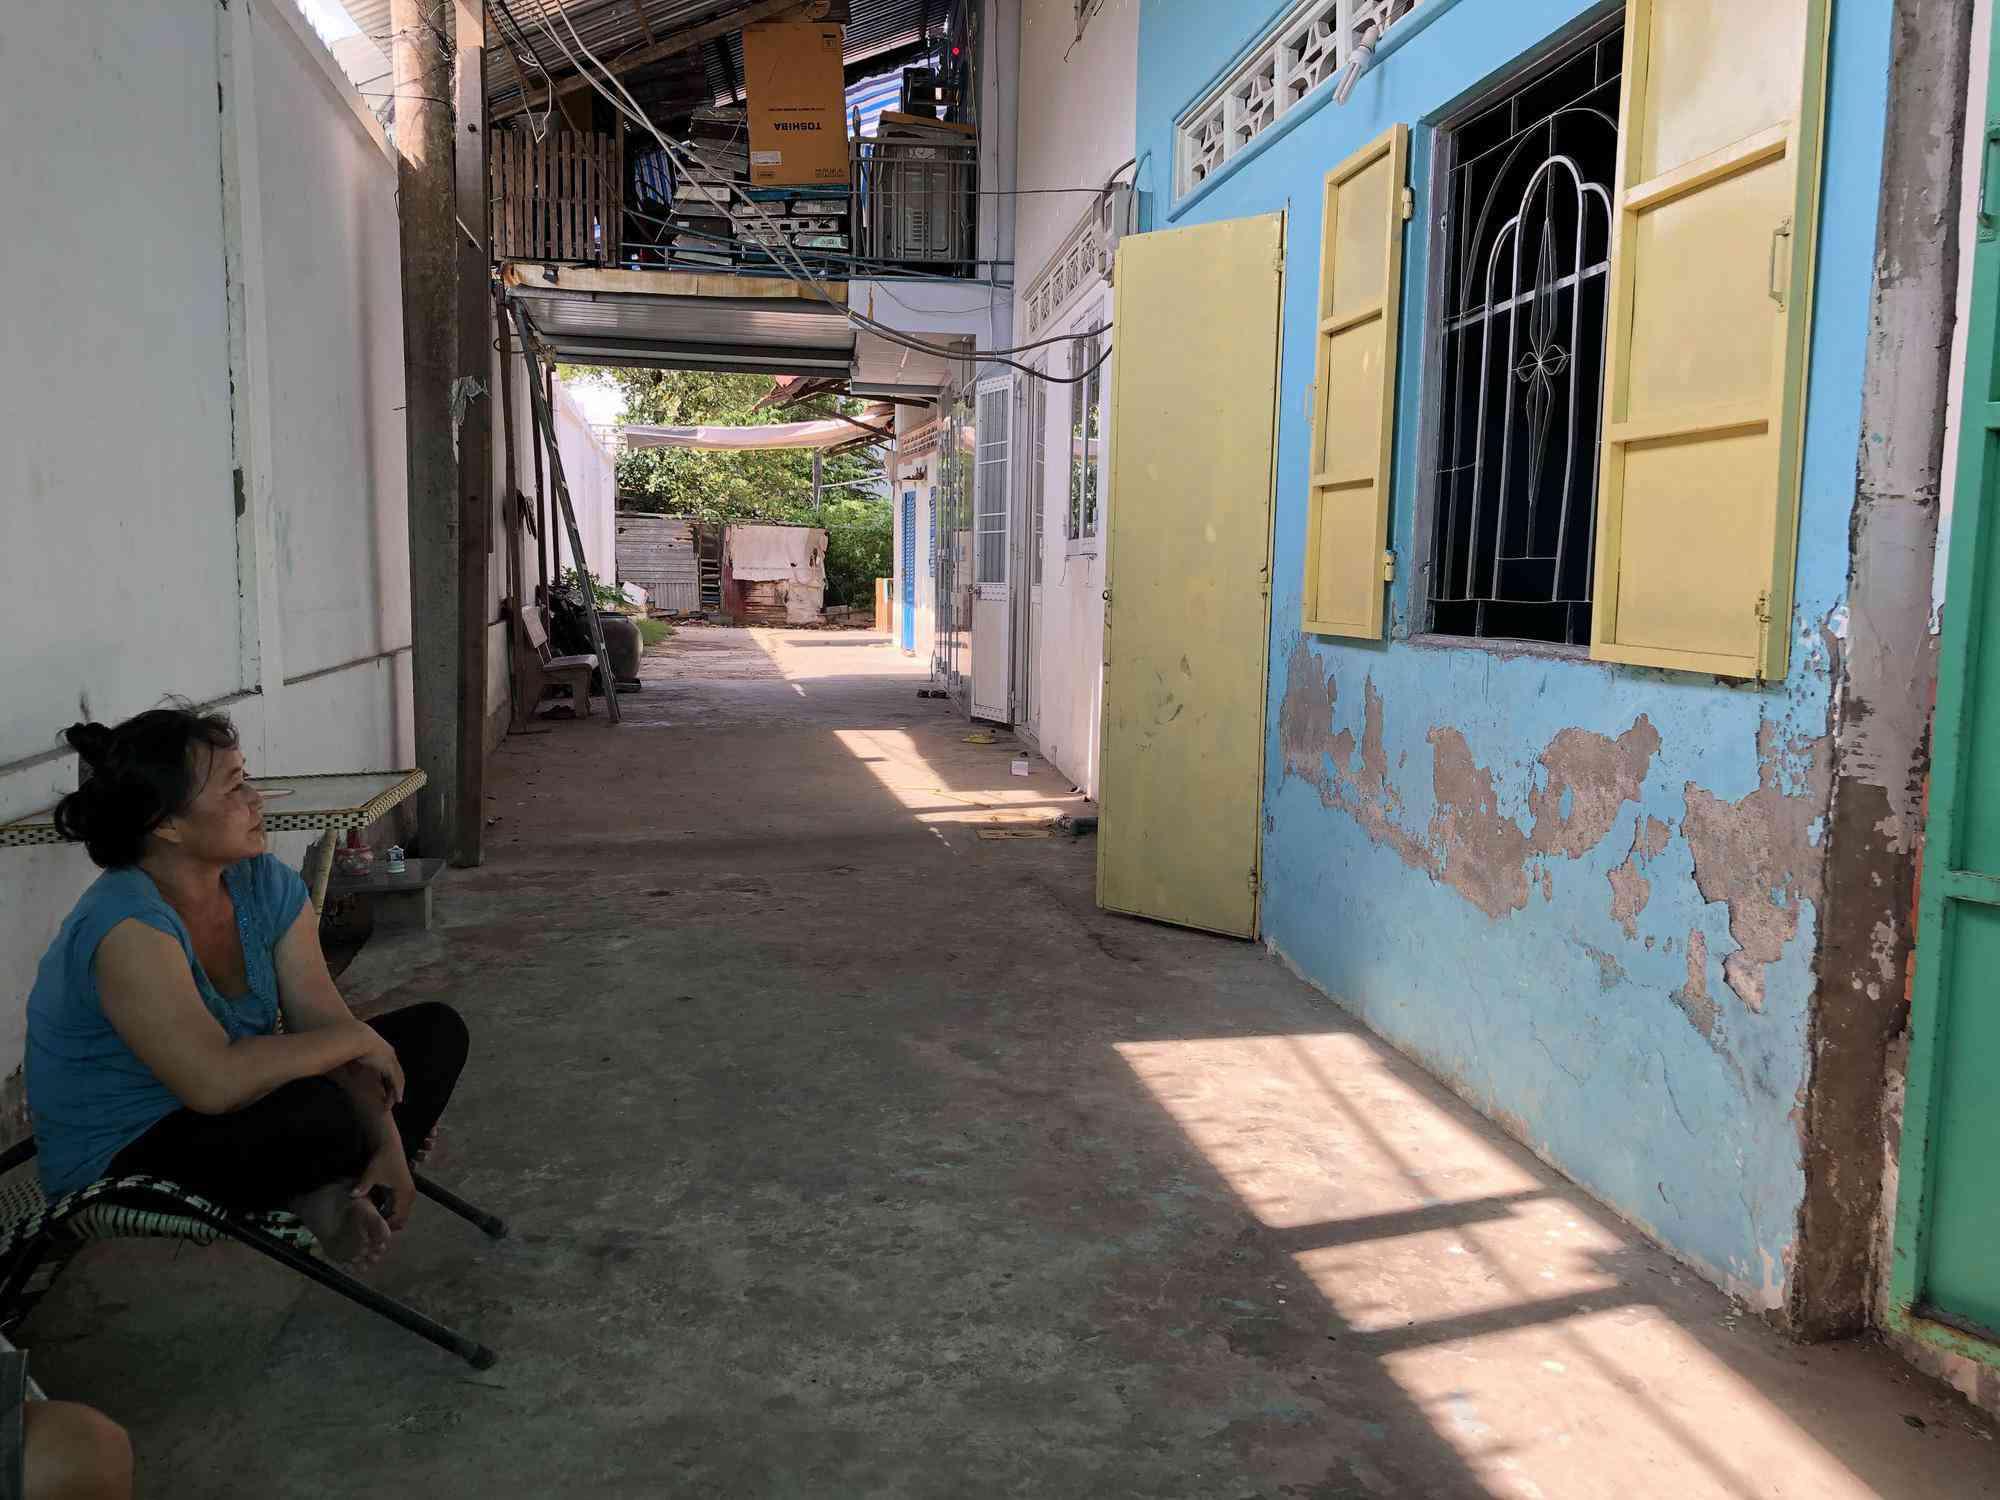 nguoi ban hang rong chi mat 20 giay de vao khu cach ly covid-19 benh vien da khoa bac lieu - 6